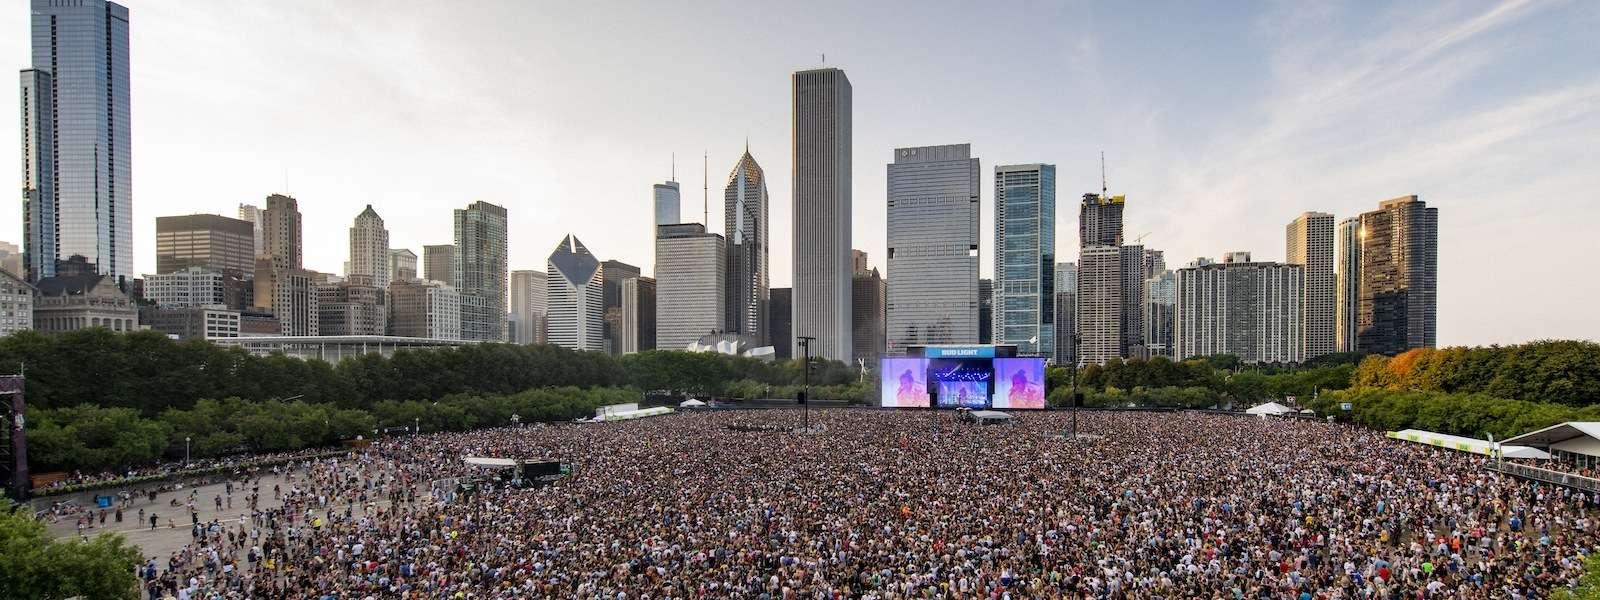 The Lollapalooza Experience